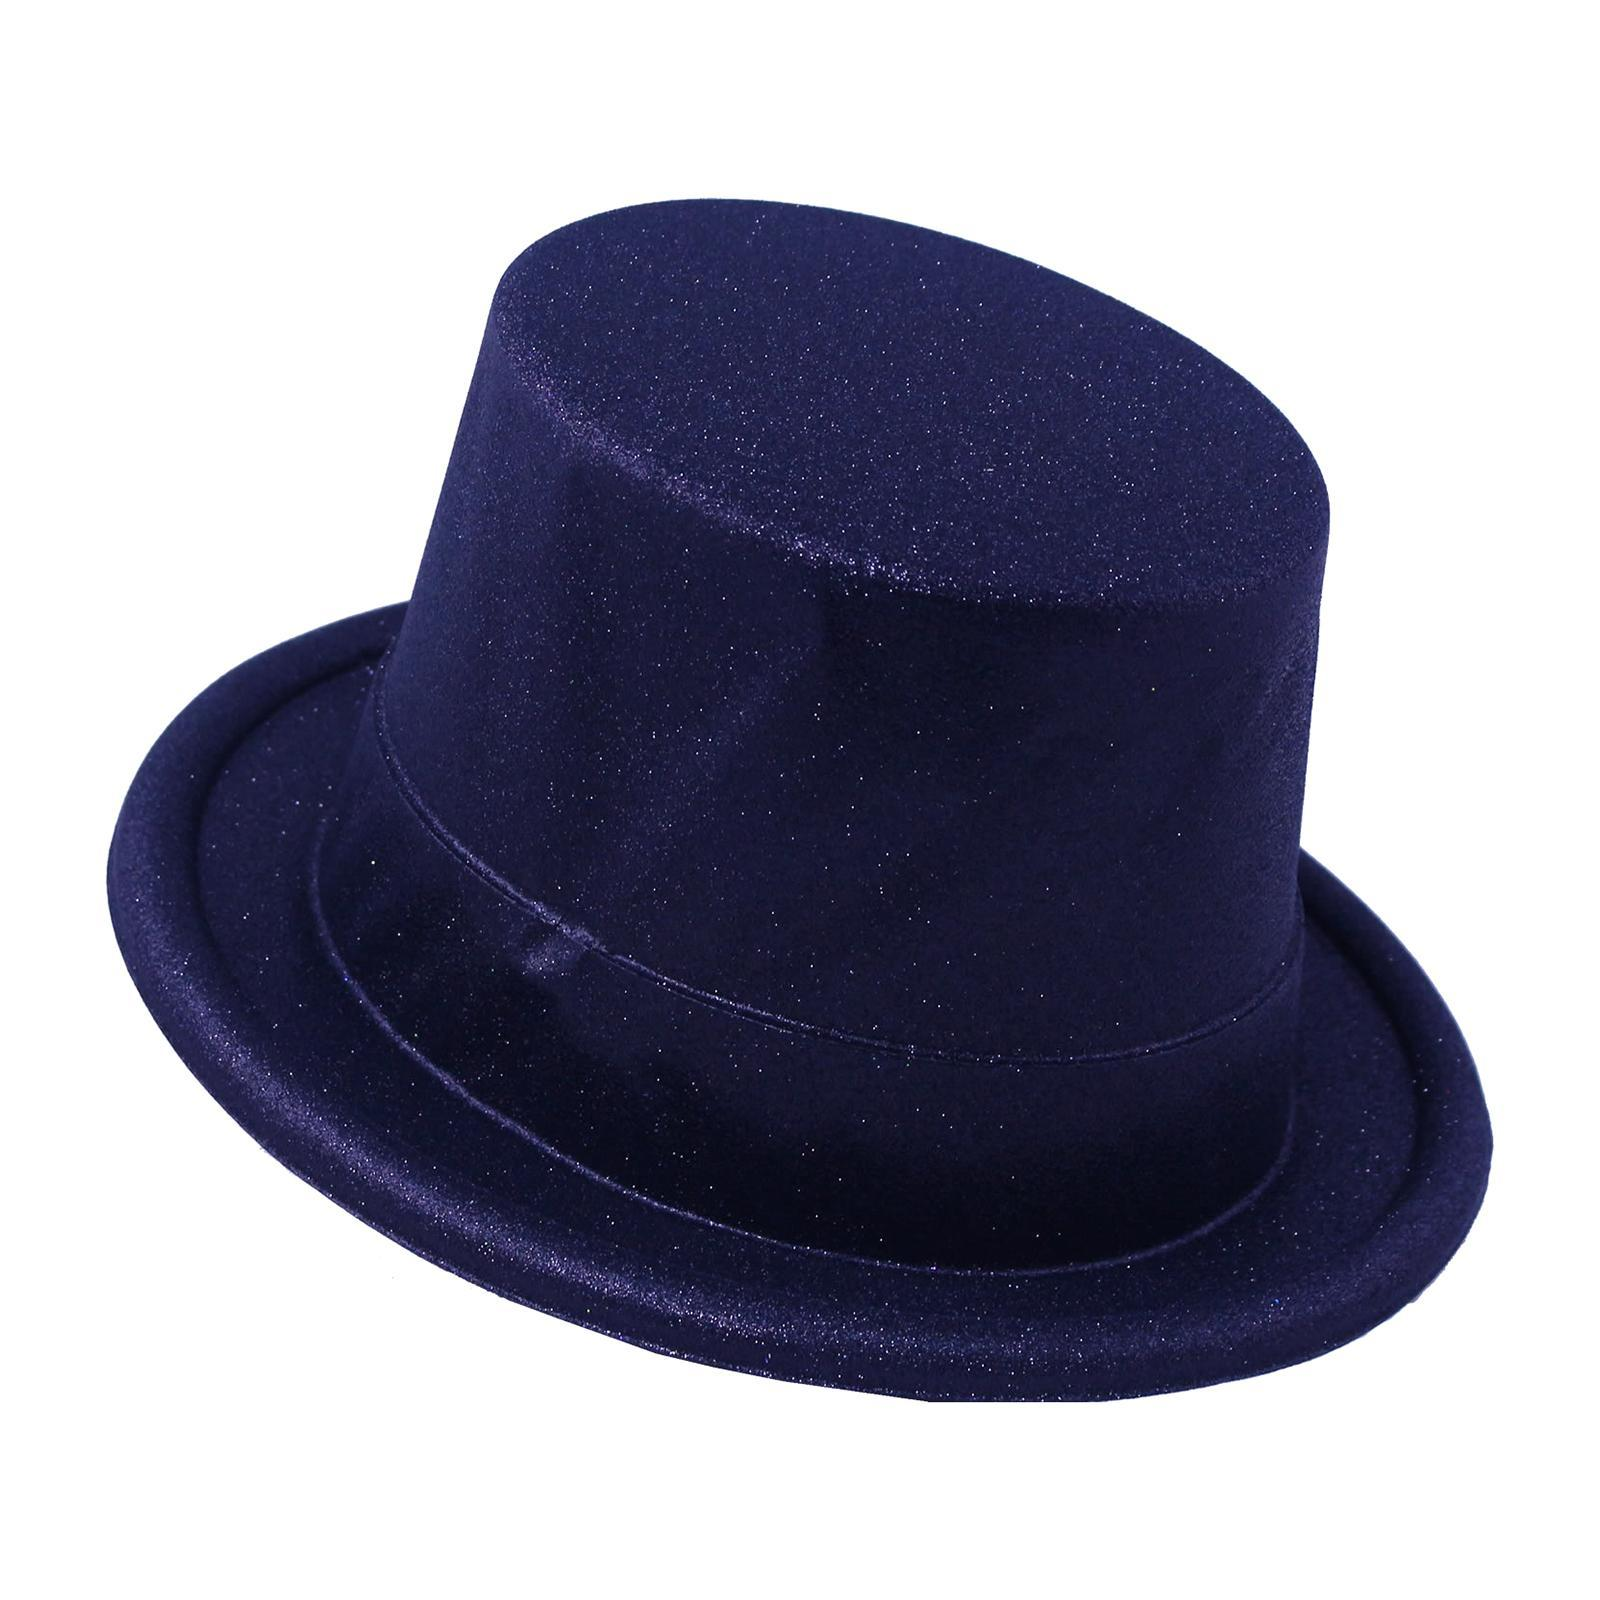 Partyforte Christmas Accessory Christmas Party Hat Top Hat Glitter Party Hat - Black Color 5 Pcs